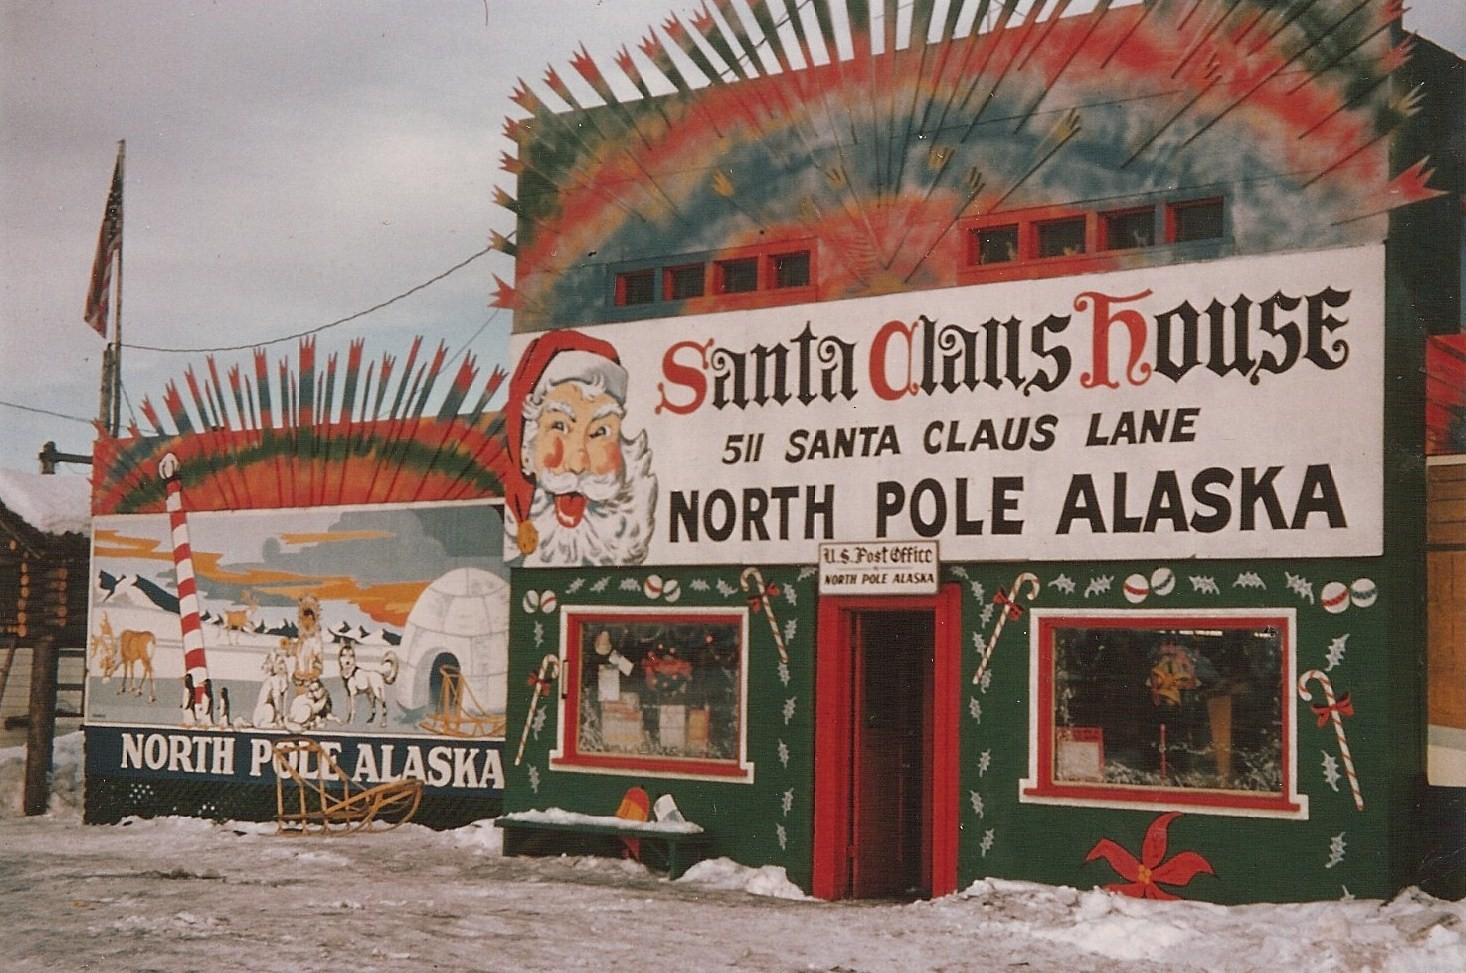 North Pole Alaska San Diego Reader